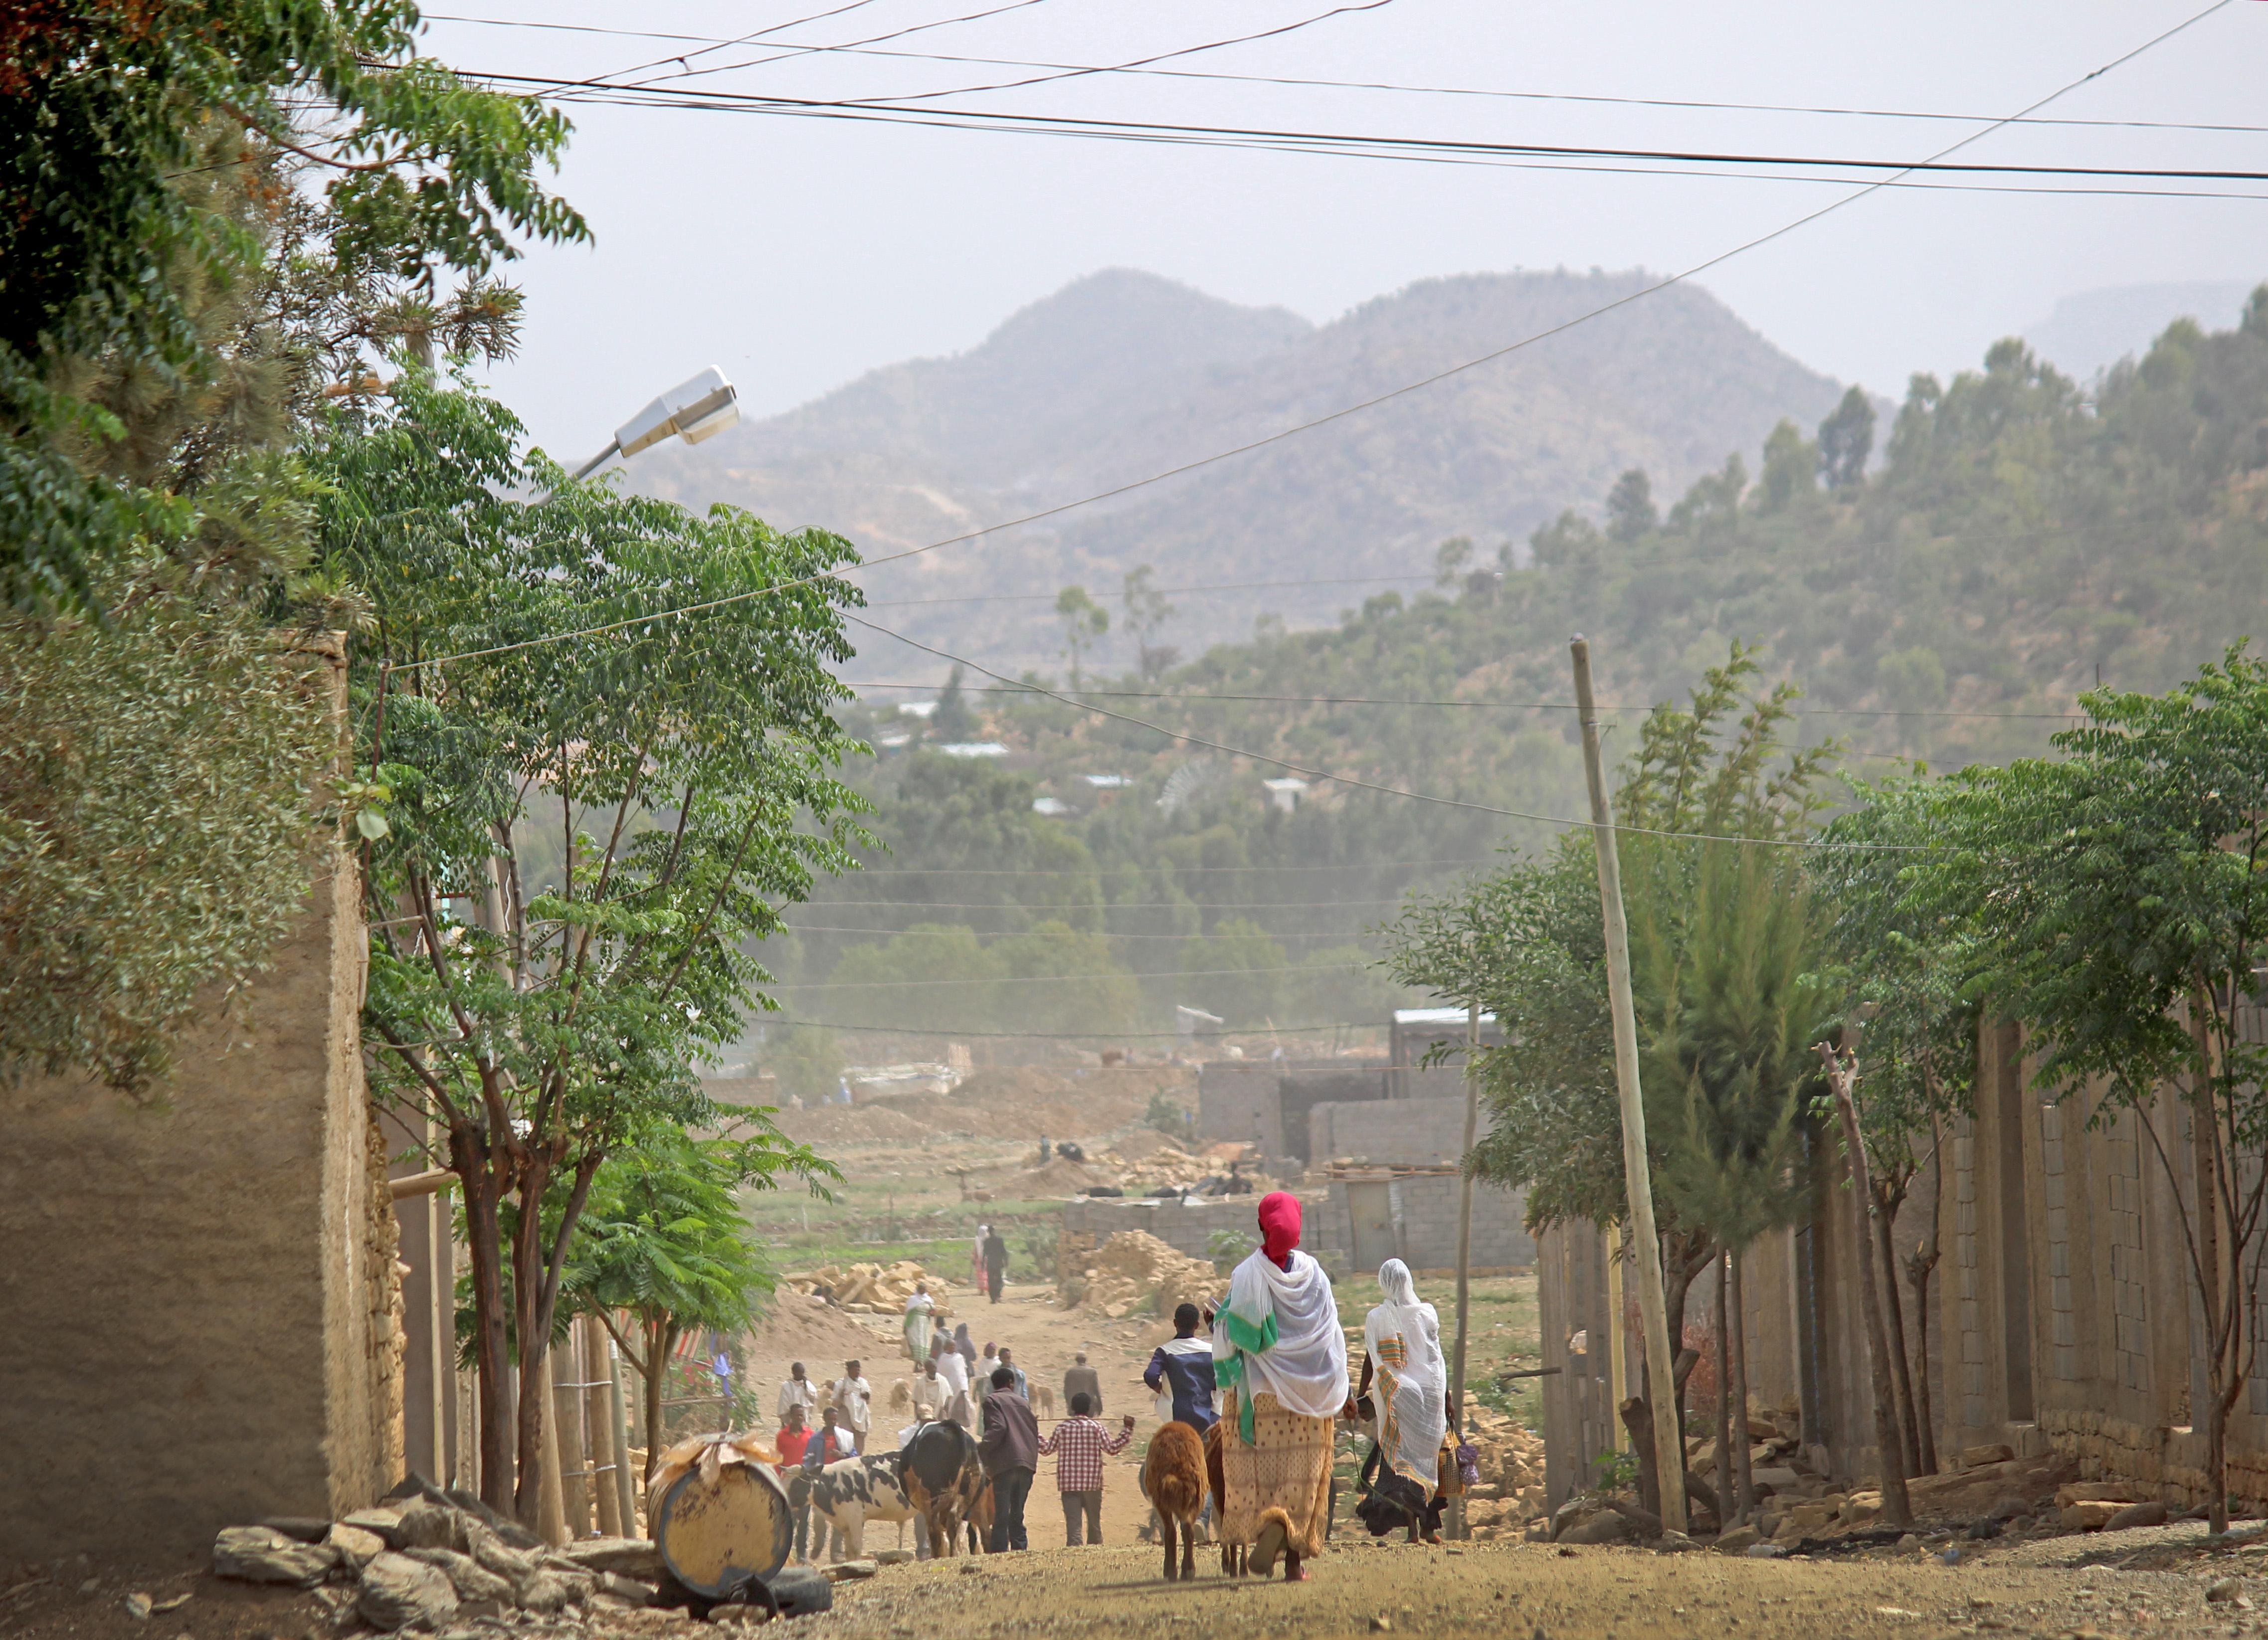 Street in Wukro, Ethiopia; credit: Marina Korzenevica Proud; Credit: Marina Korzenevica-Proud